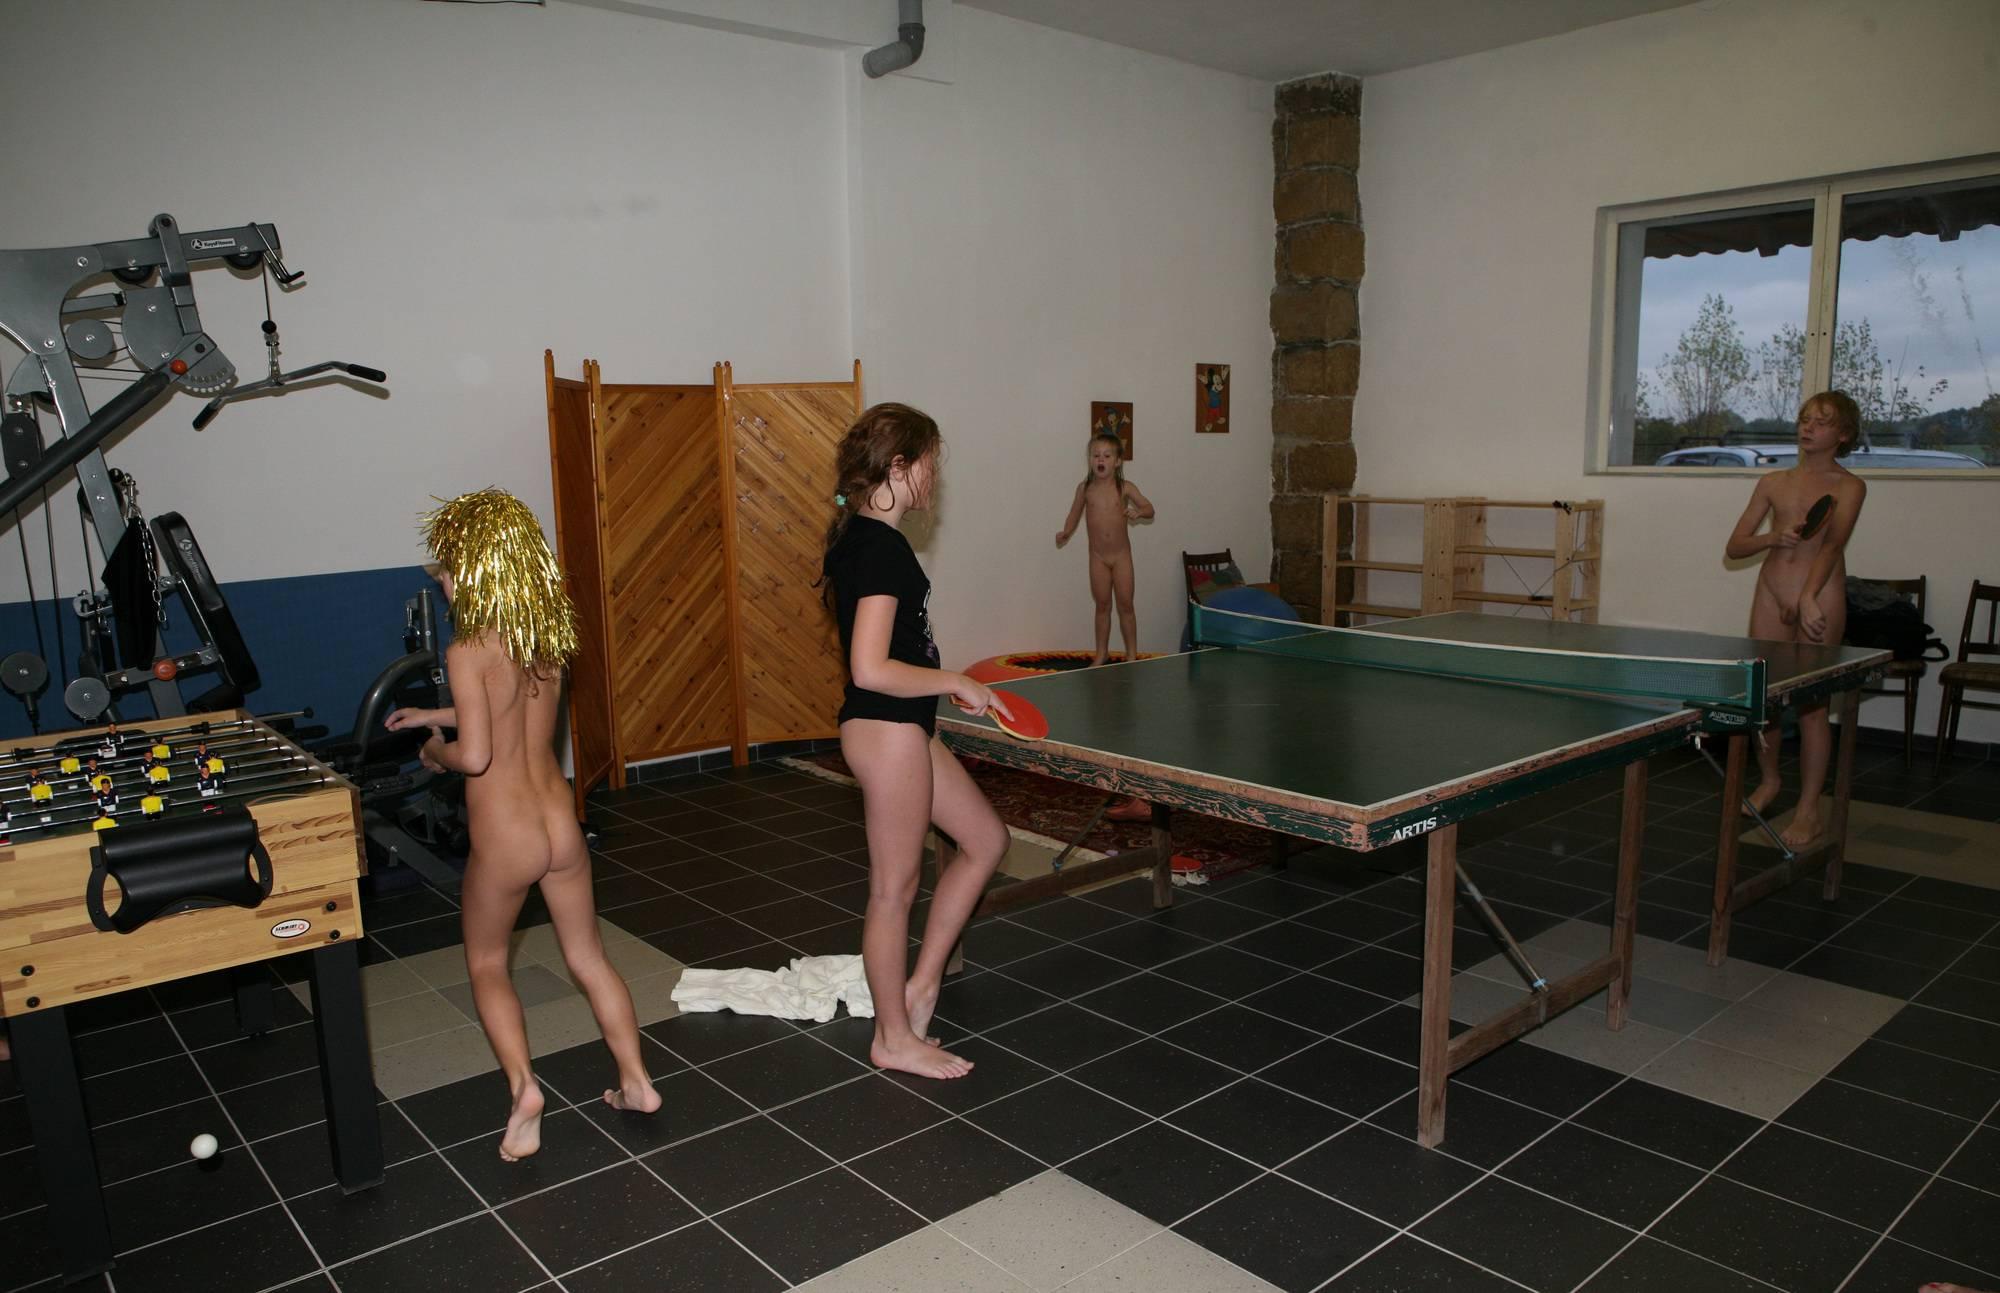 Nudist Photos Privat Hotel Event - 1